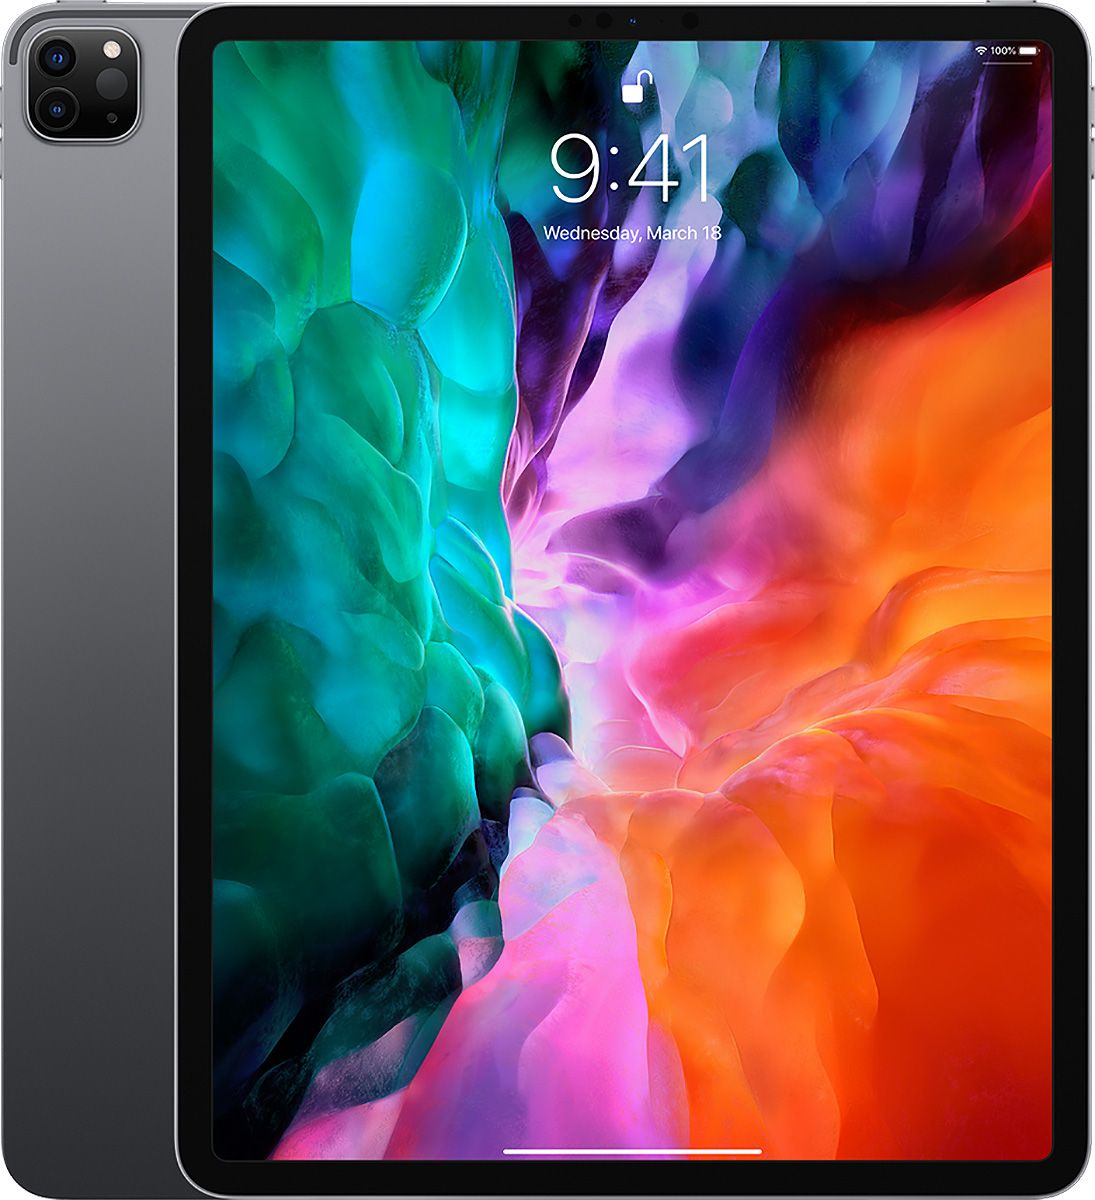 Apple Ipad Pro 12 9 Inch 256gb Wi Fi Space Gray 2020 Mxat2ll A In 2021 Apple Ipad Pro Ipad Pro 12 Ipad Pro Wallpaper